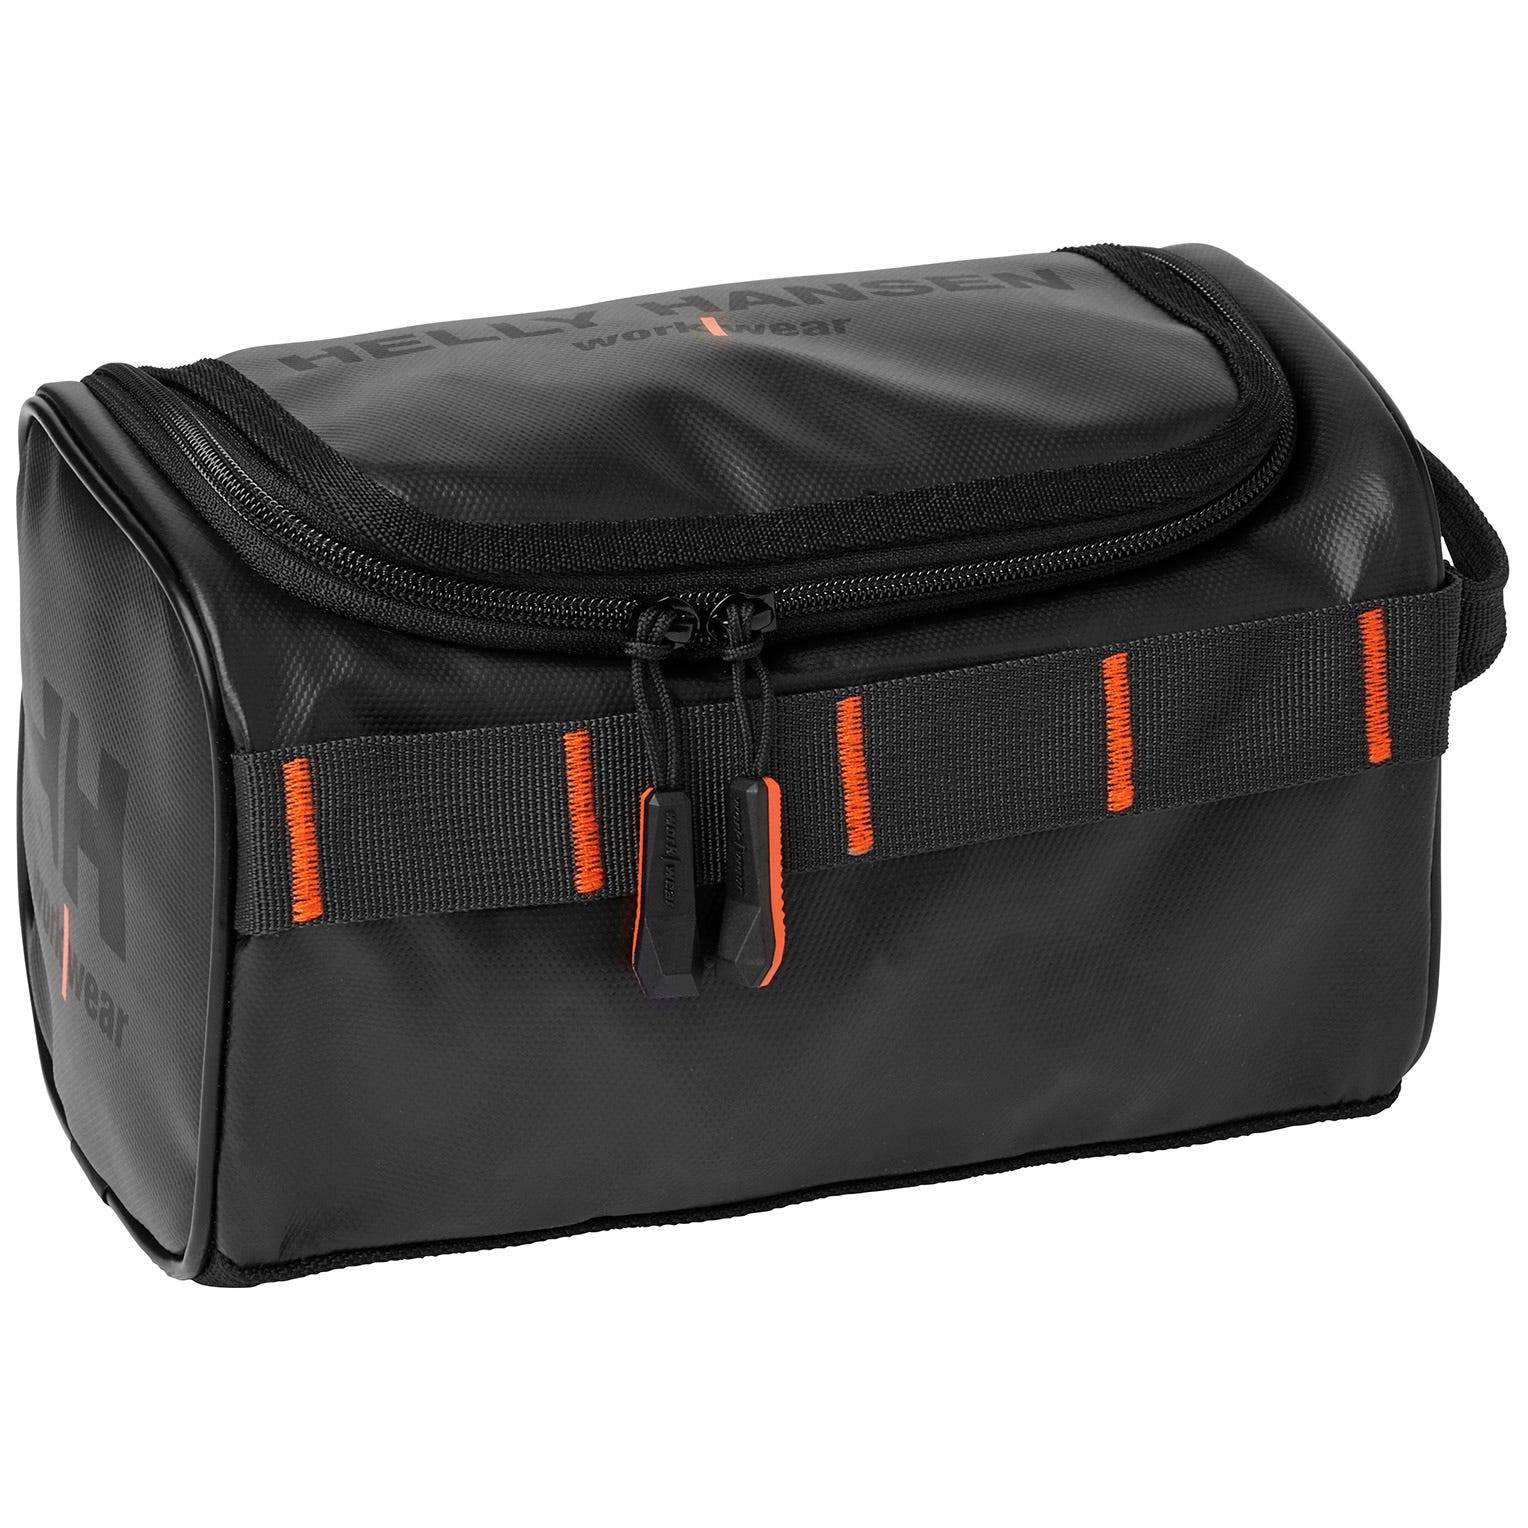 HH Workwear Helly Hansen WorkwearHH Multi Bag Black STD